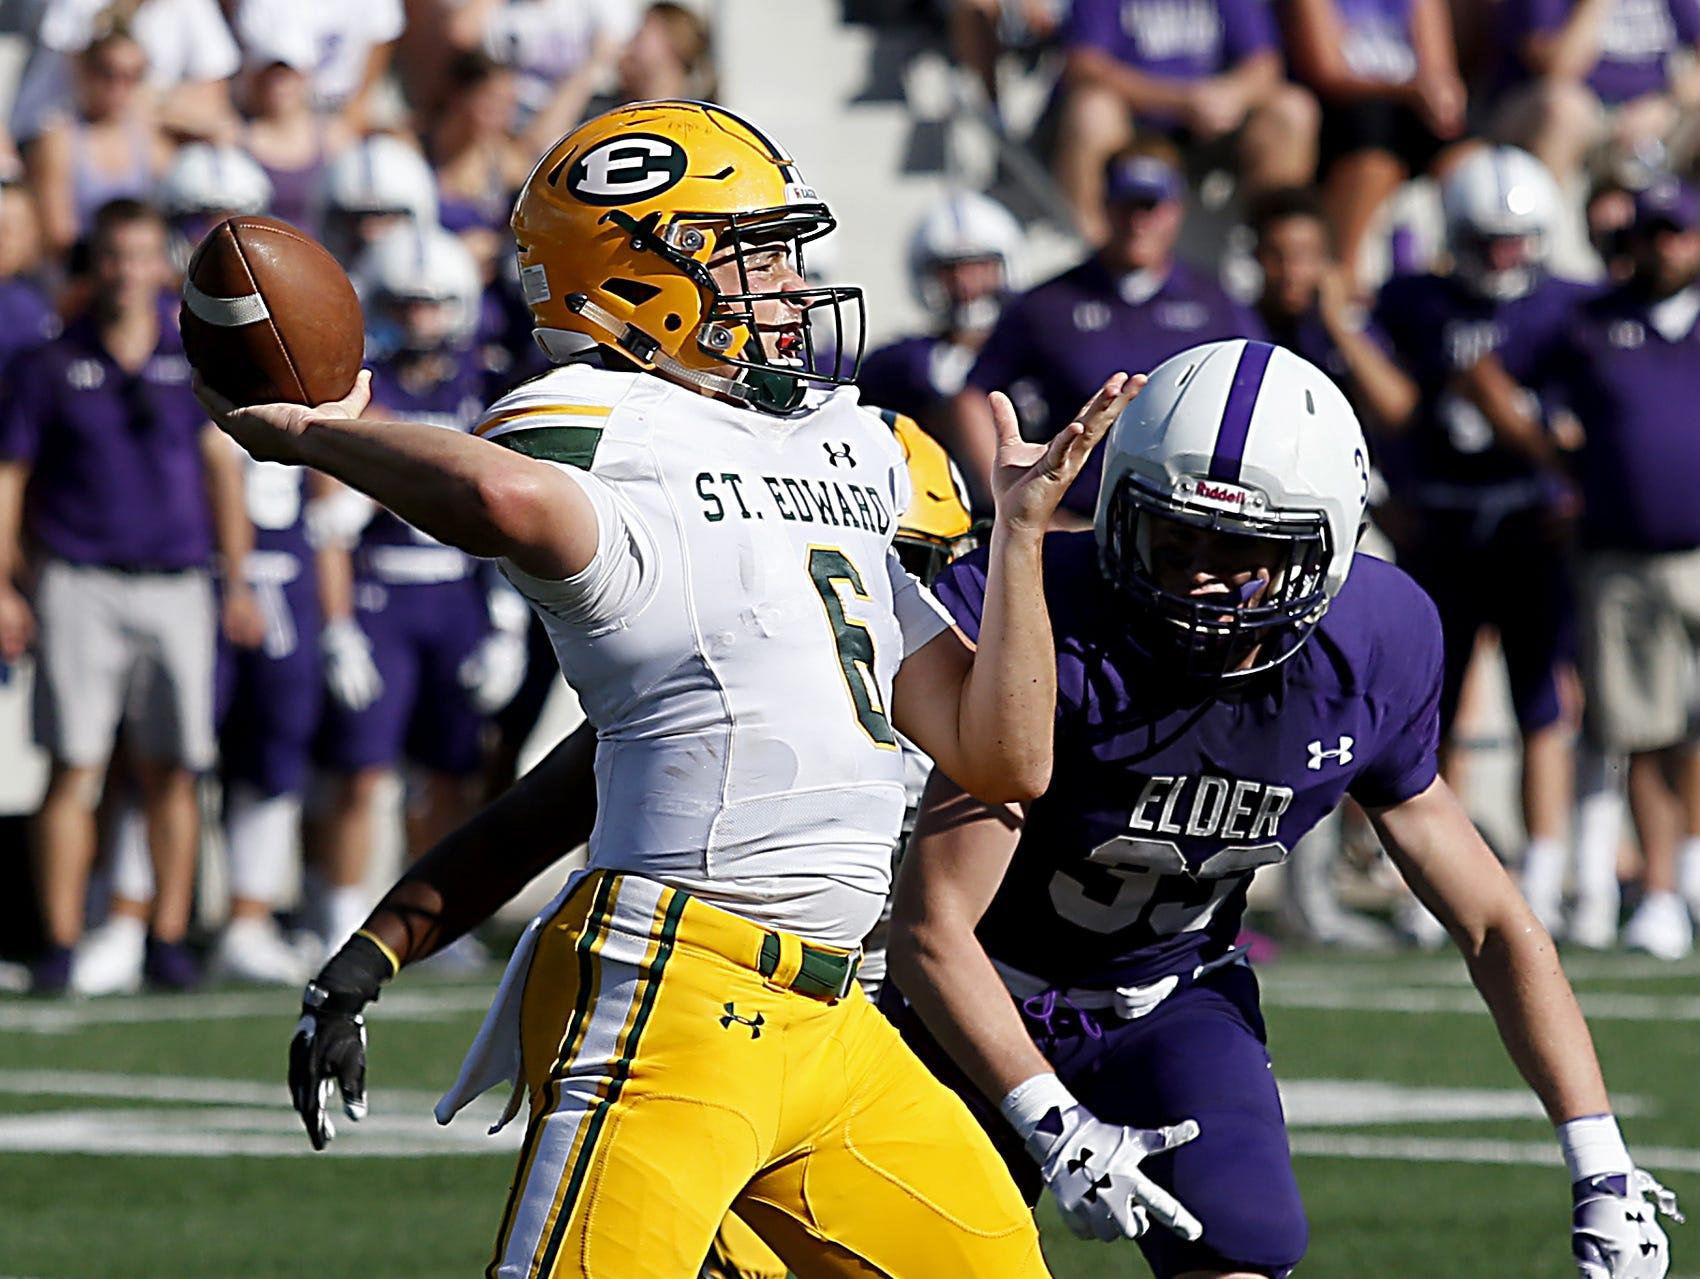 St. Edward quarterback Garrett Dzuro is rushed by Elder linebacker Jake Hofmeyer during their game at The Pit in Cincinnati Saturday, Sept. 15, 2018.